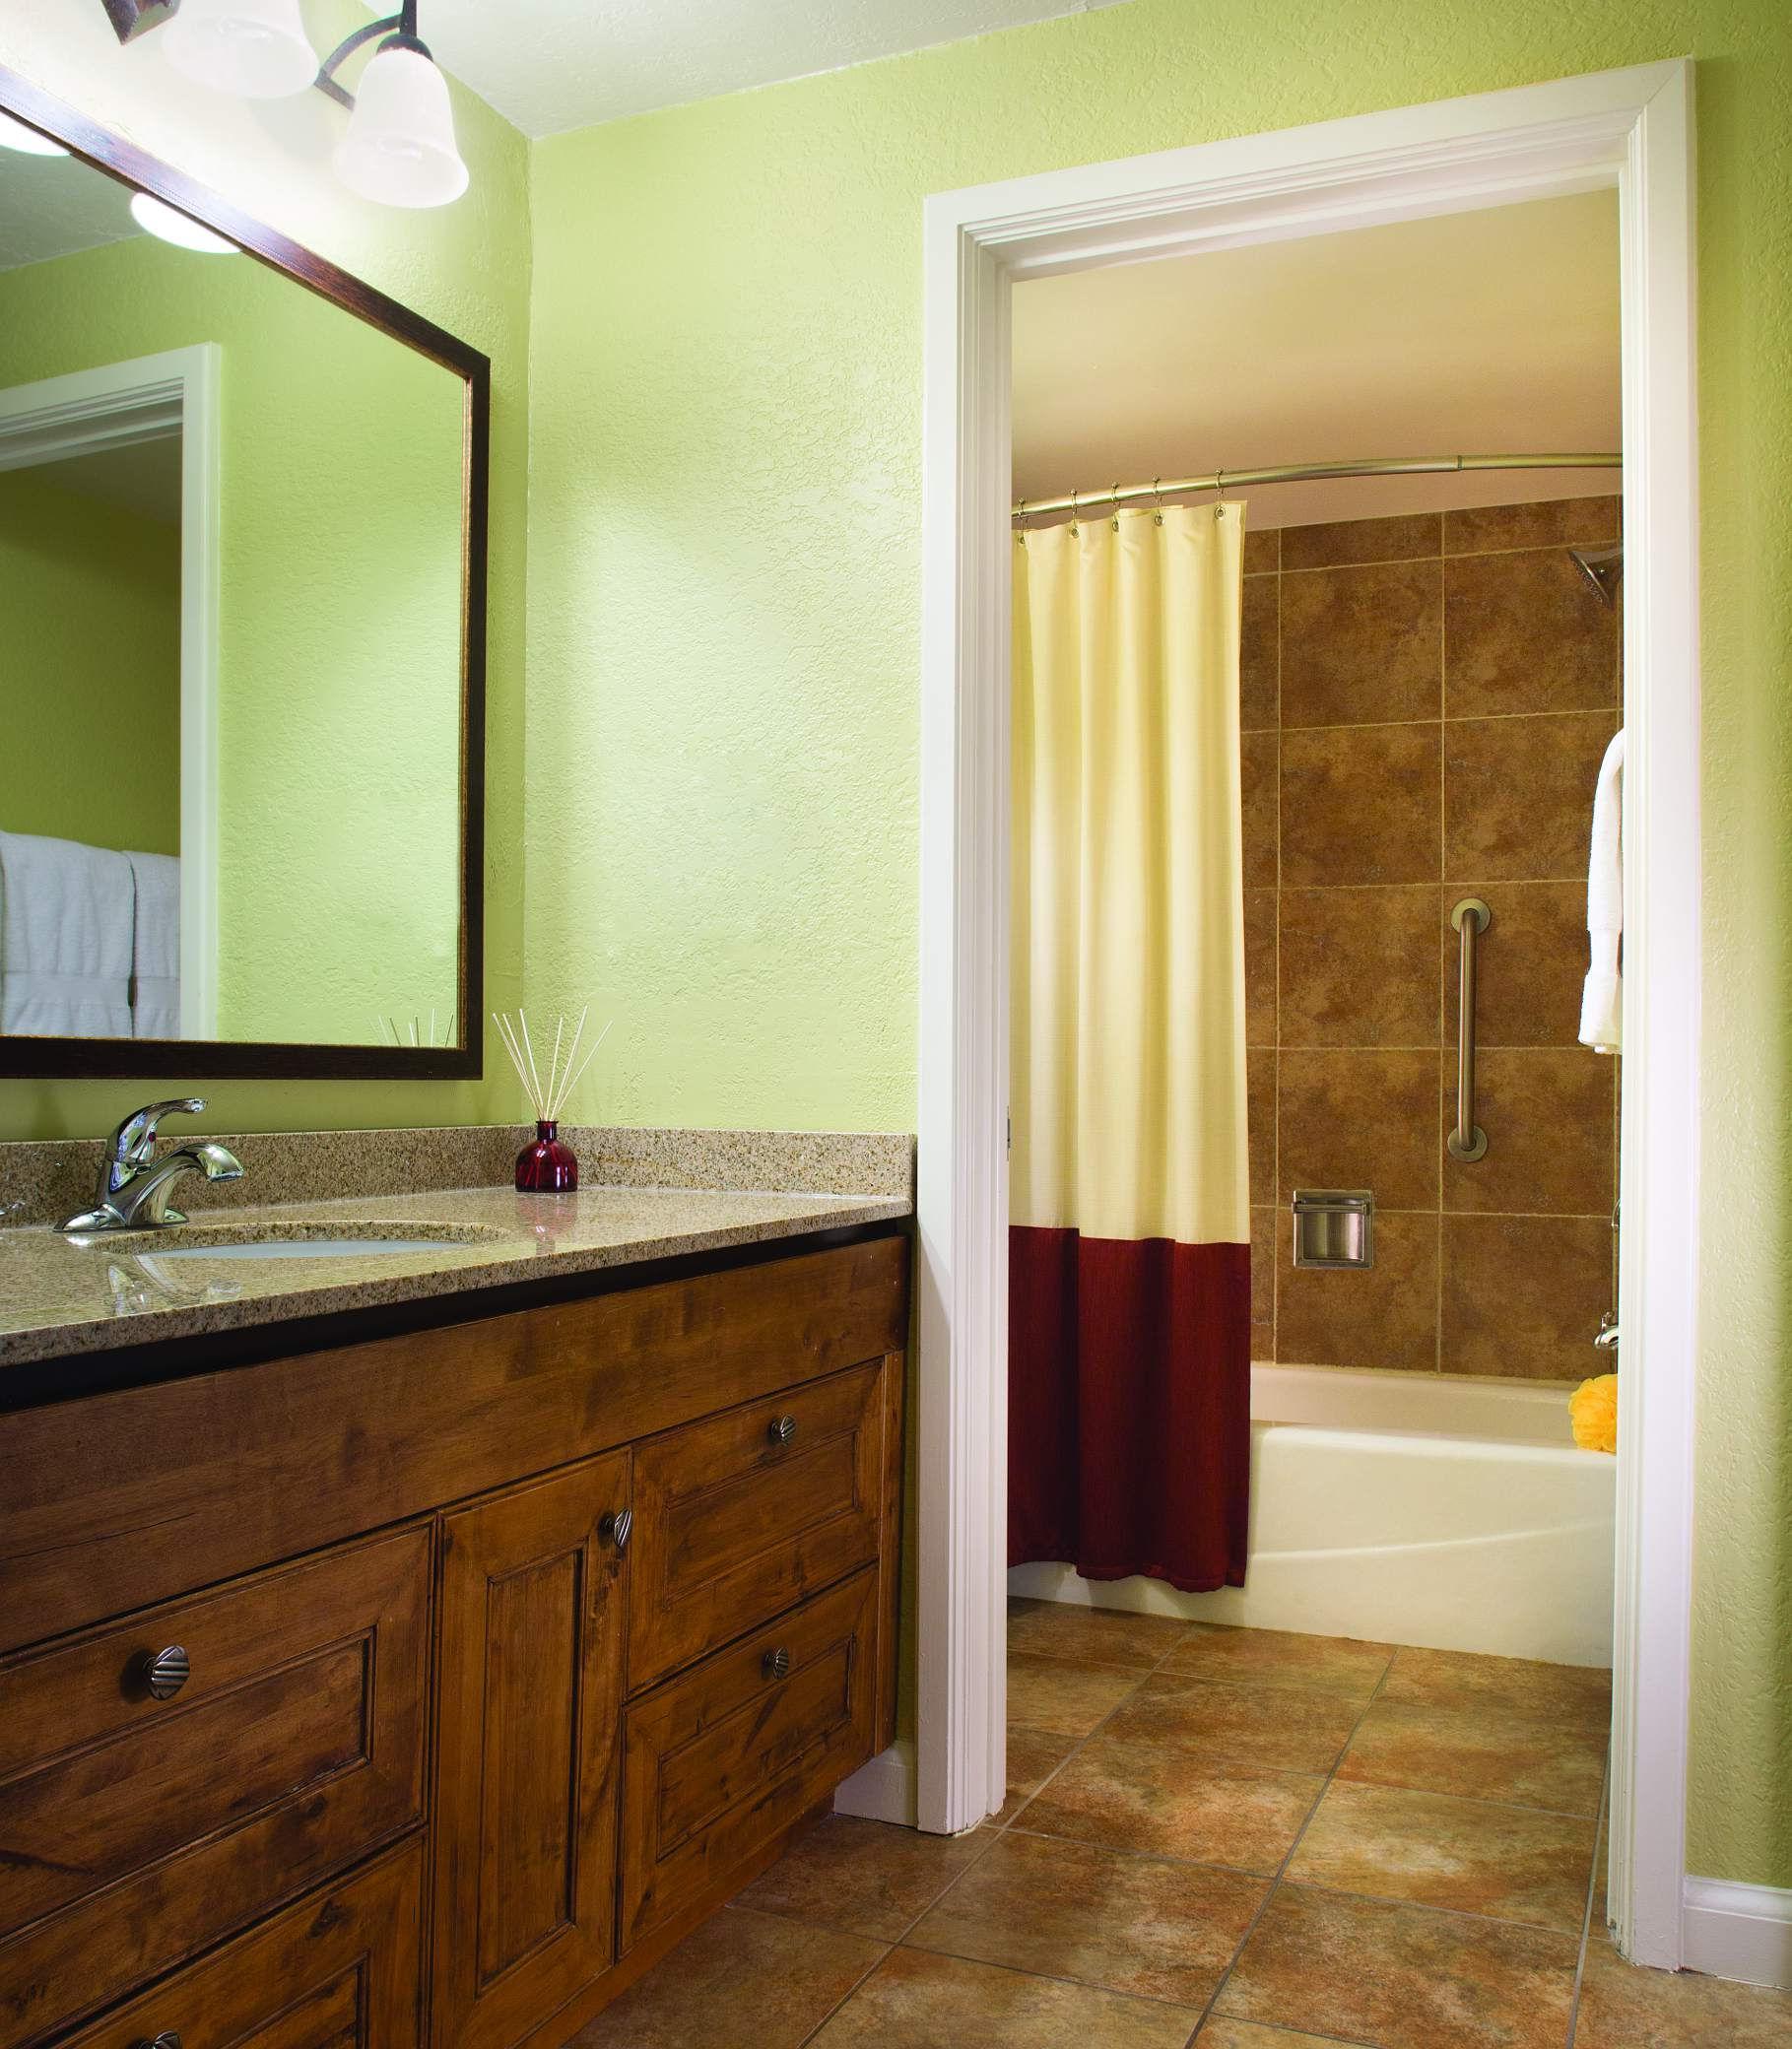 Marriott's Mountain Valley Lodge at Breckenridge image 9